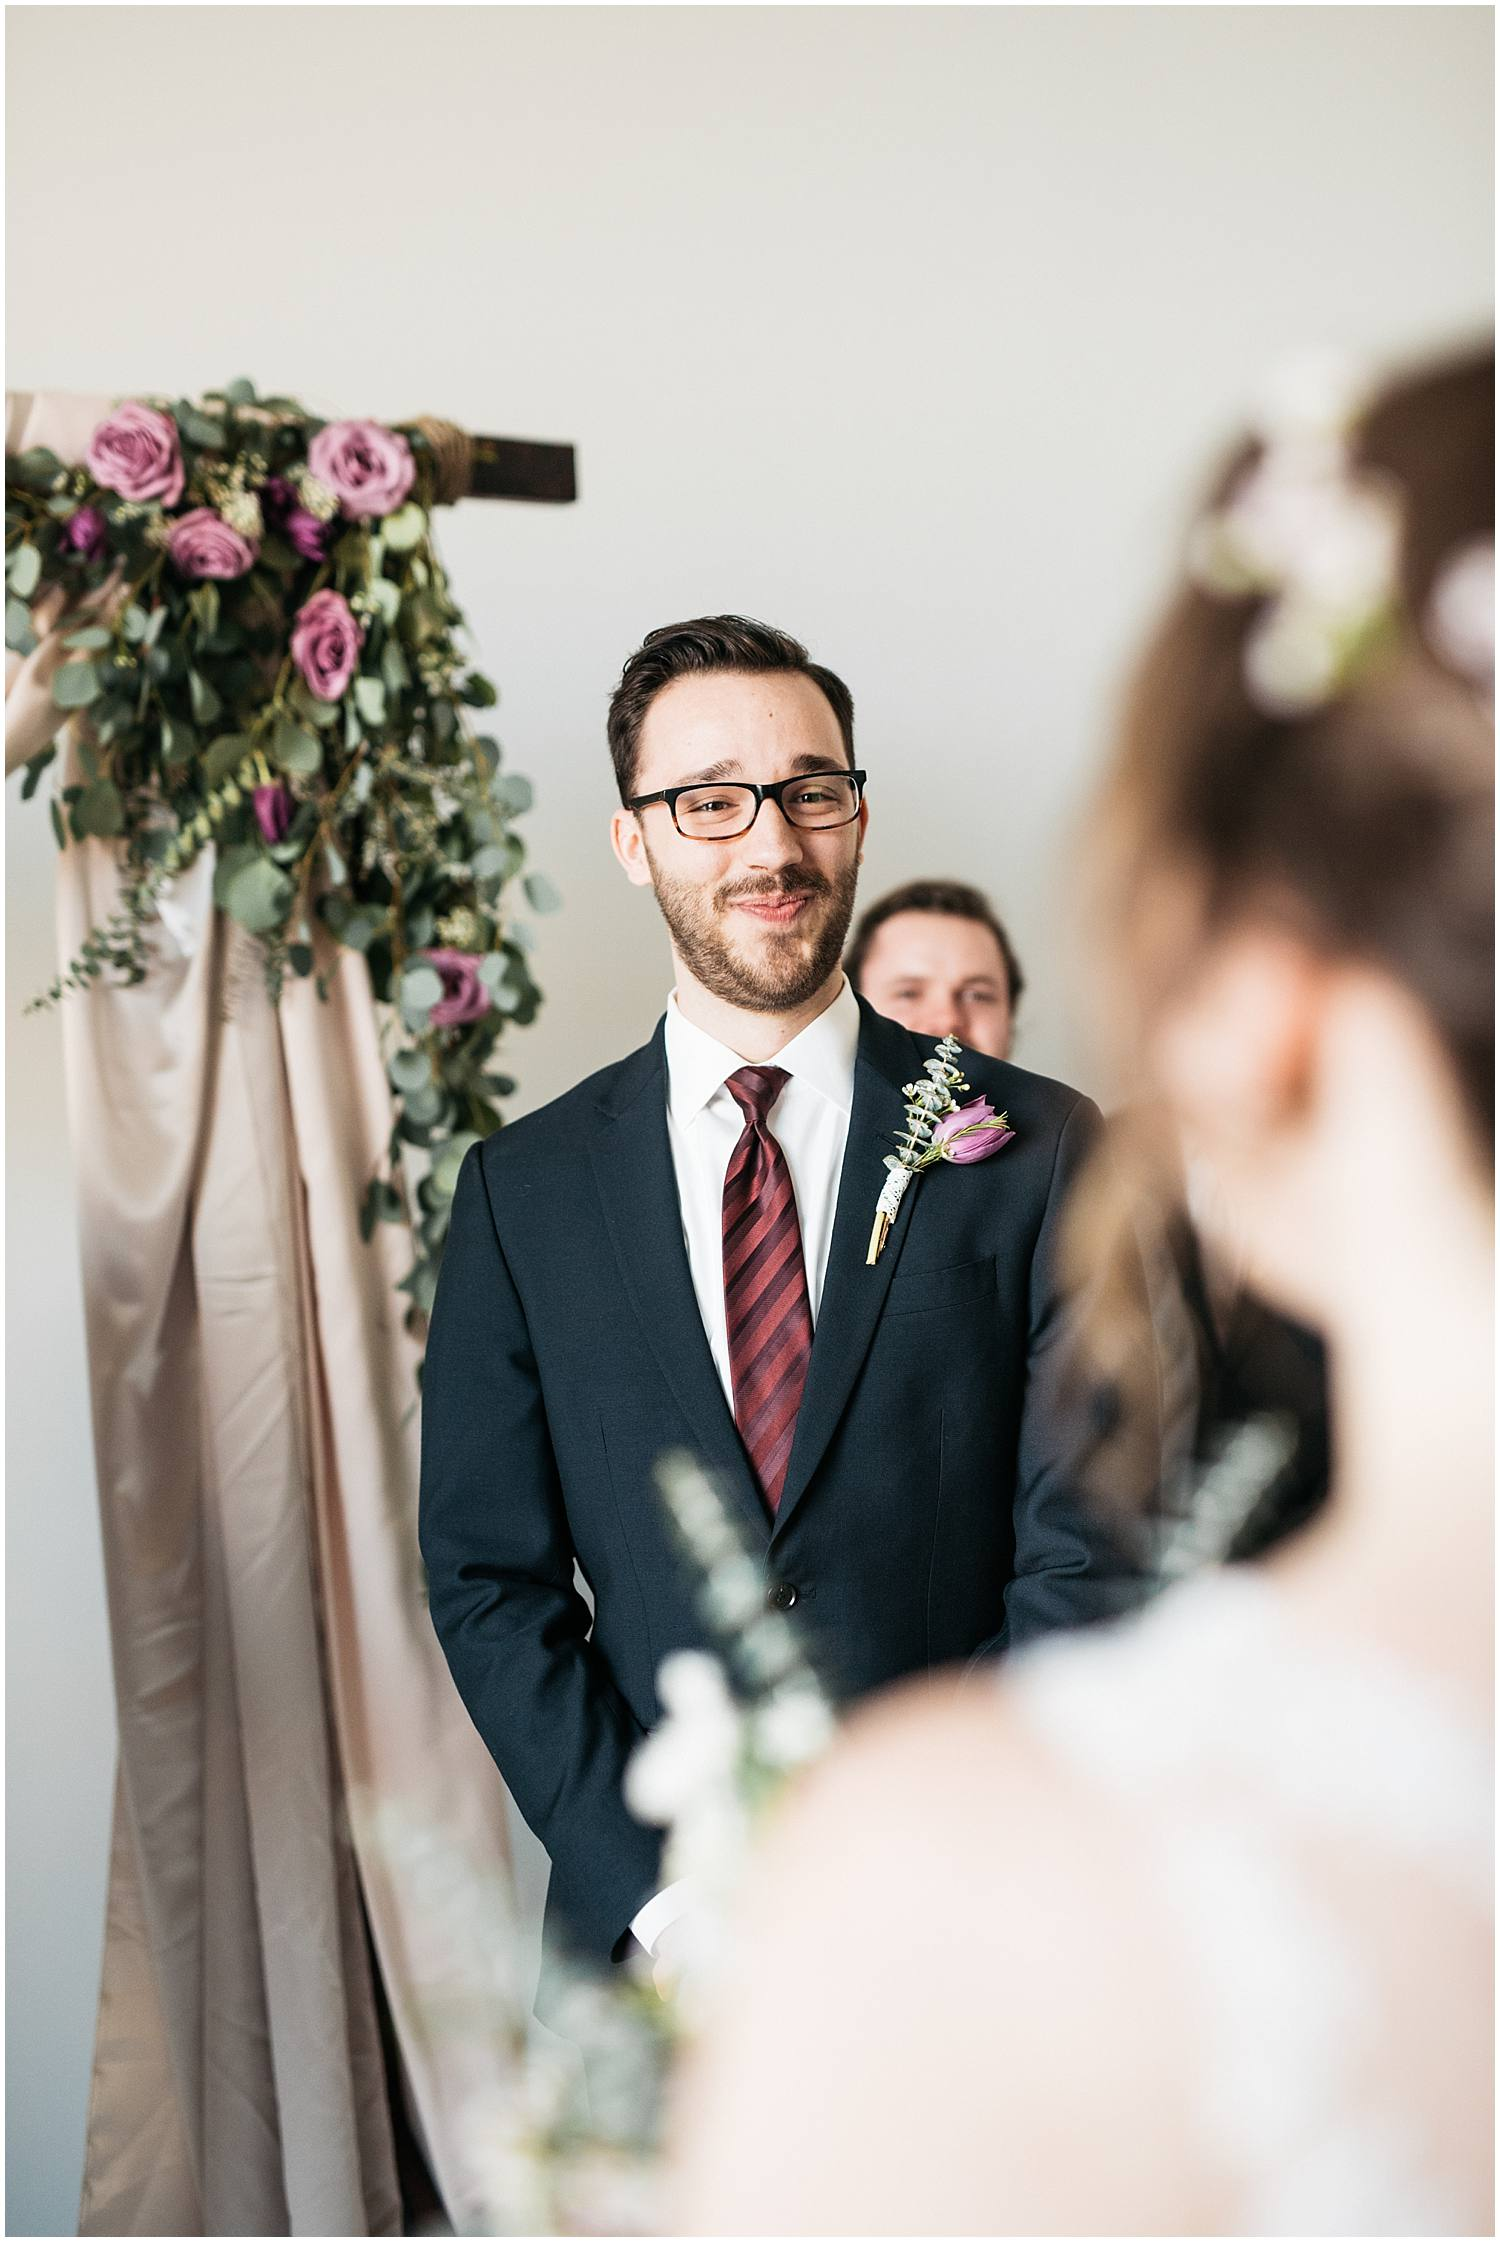 Josh - Emily - wedding - supply manheim- www.gabemcmullen.com55.jpg